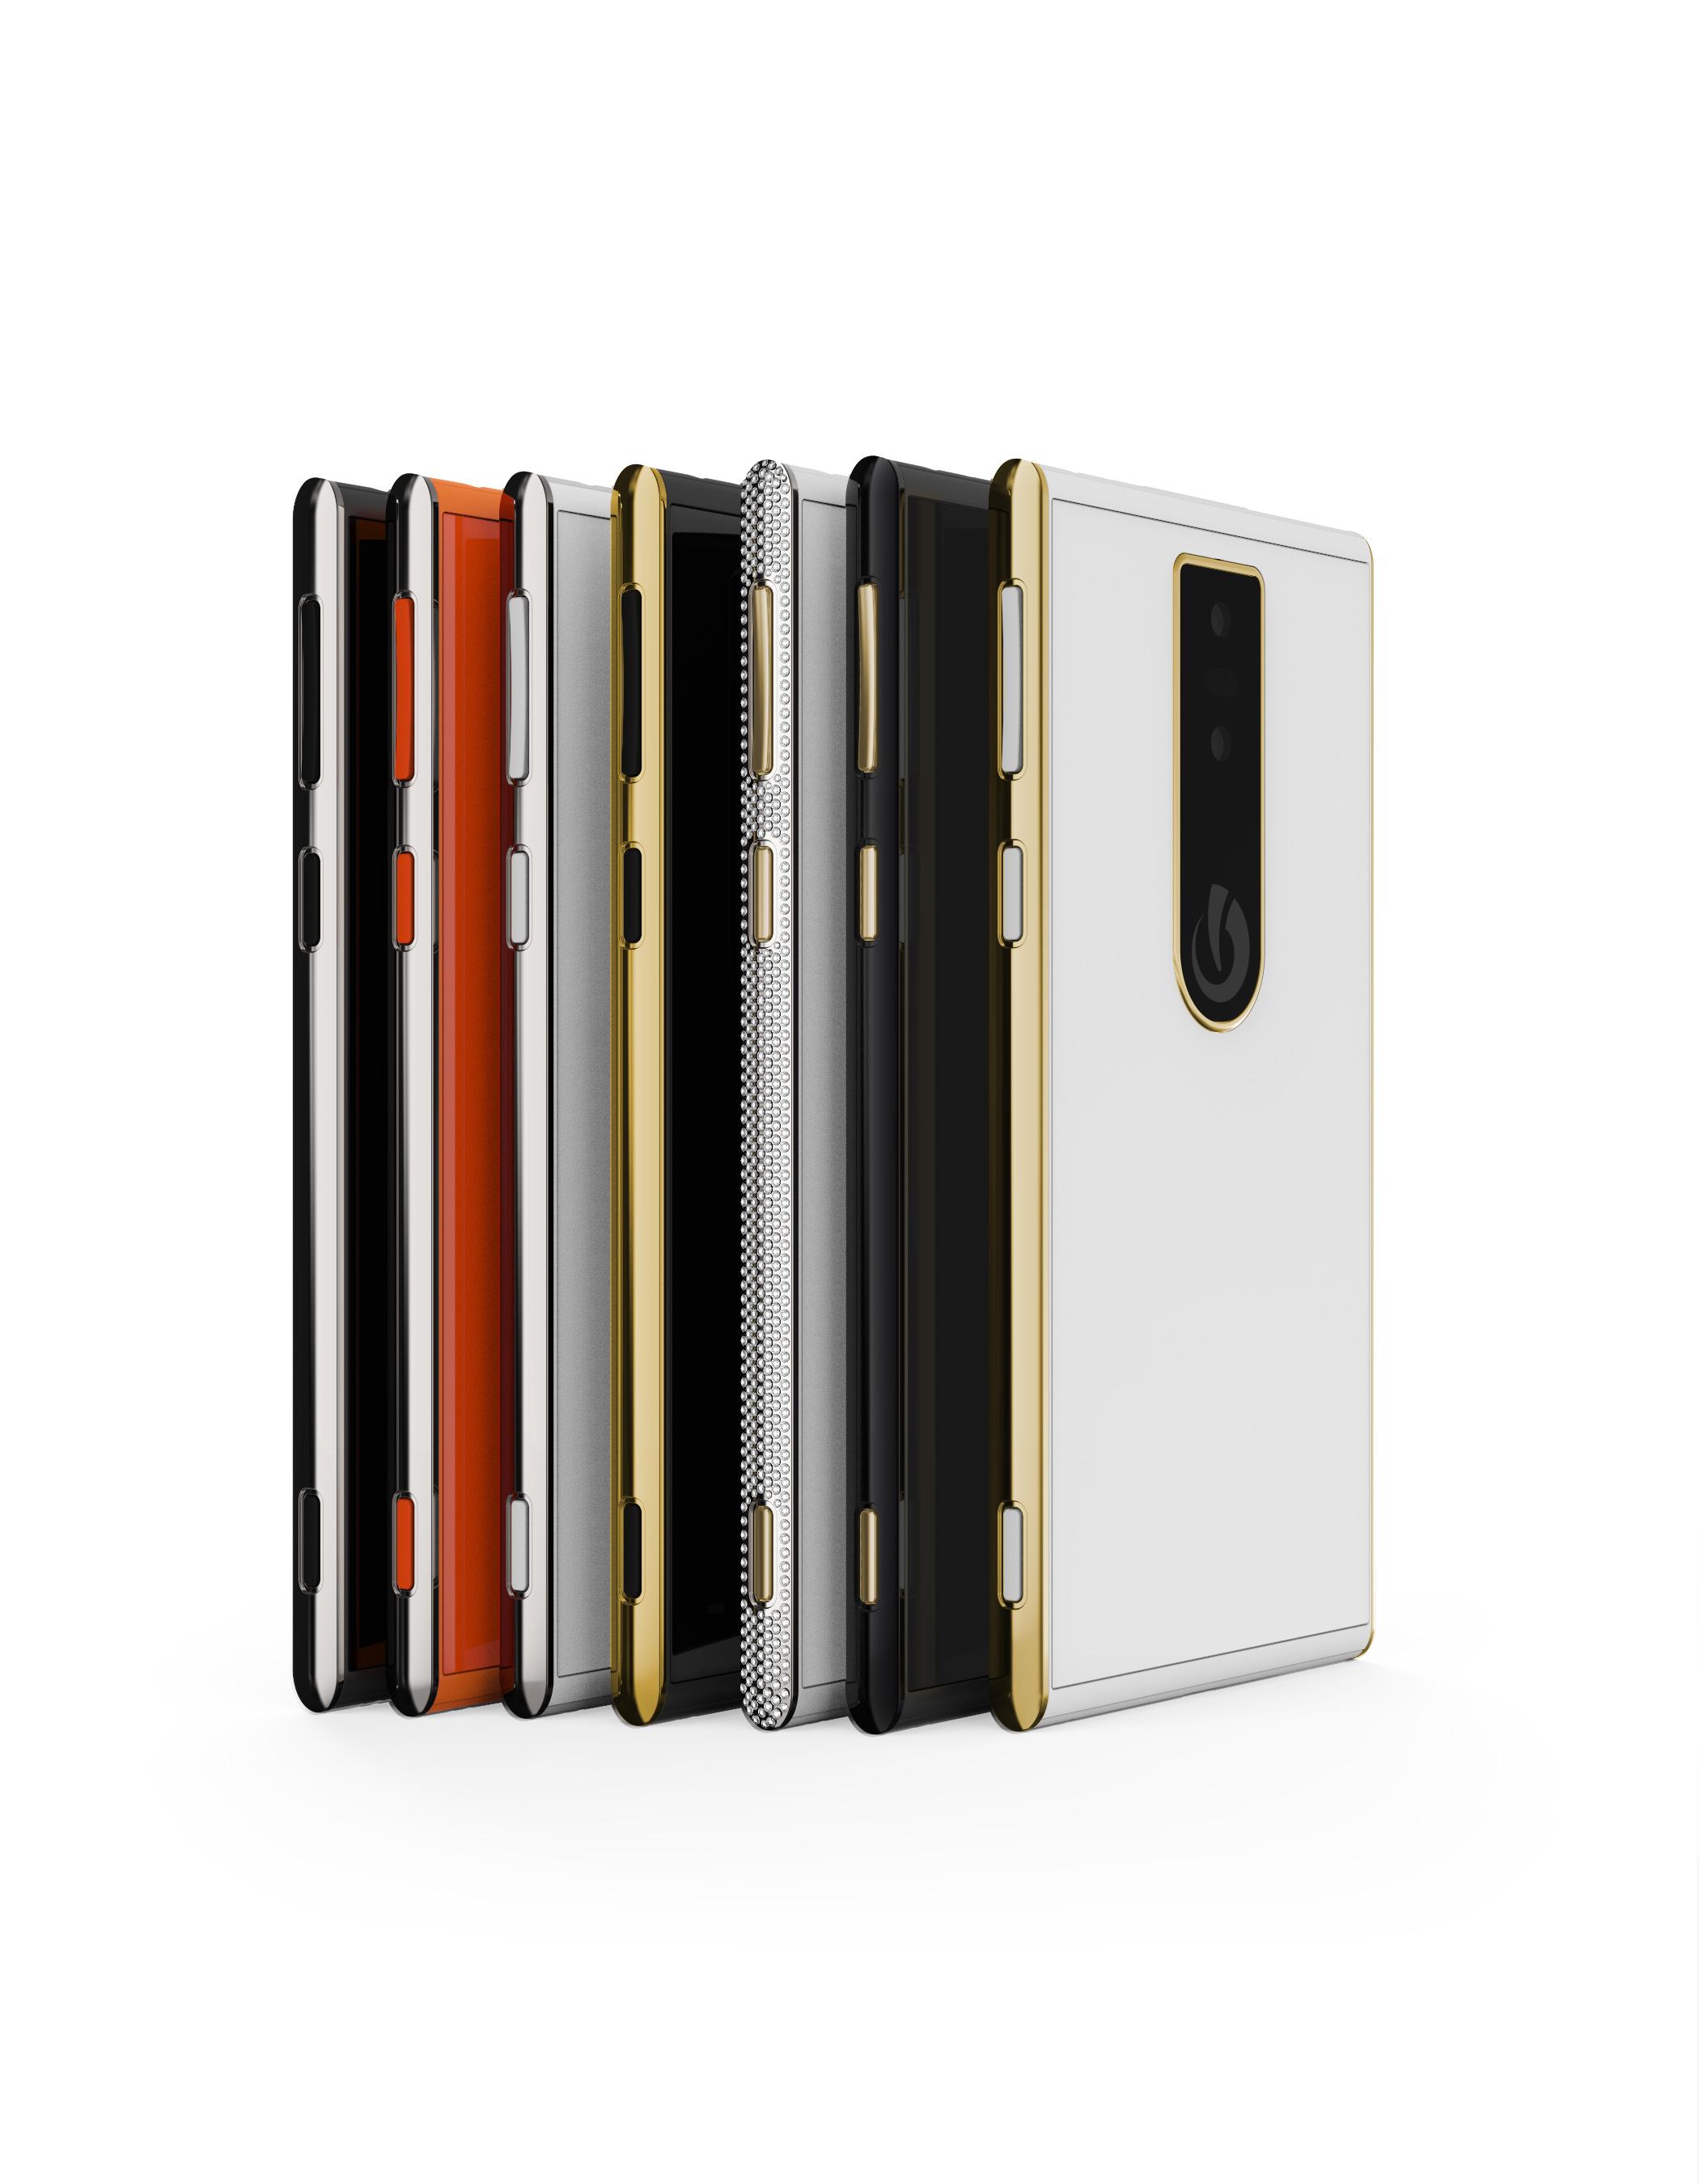 Http Deca Core Vernee Apollo Lite Specifications Xiaomi Redmi Note 4g Dual Sim Putih Lumigon T3 Tgf